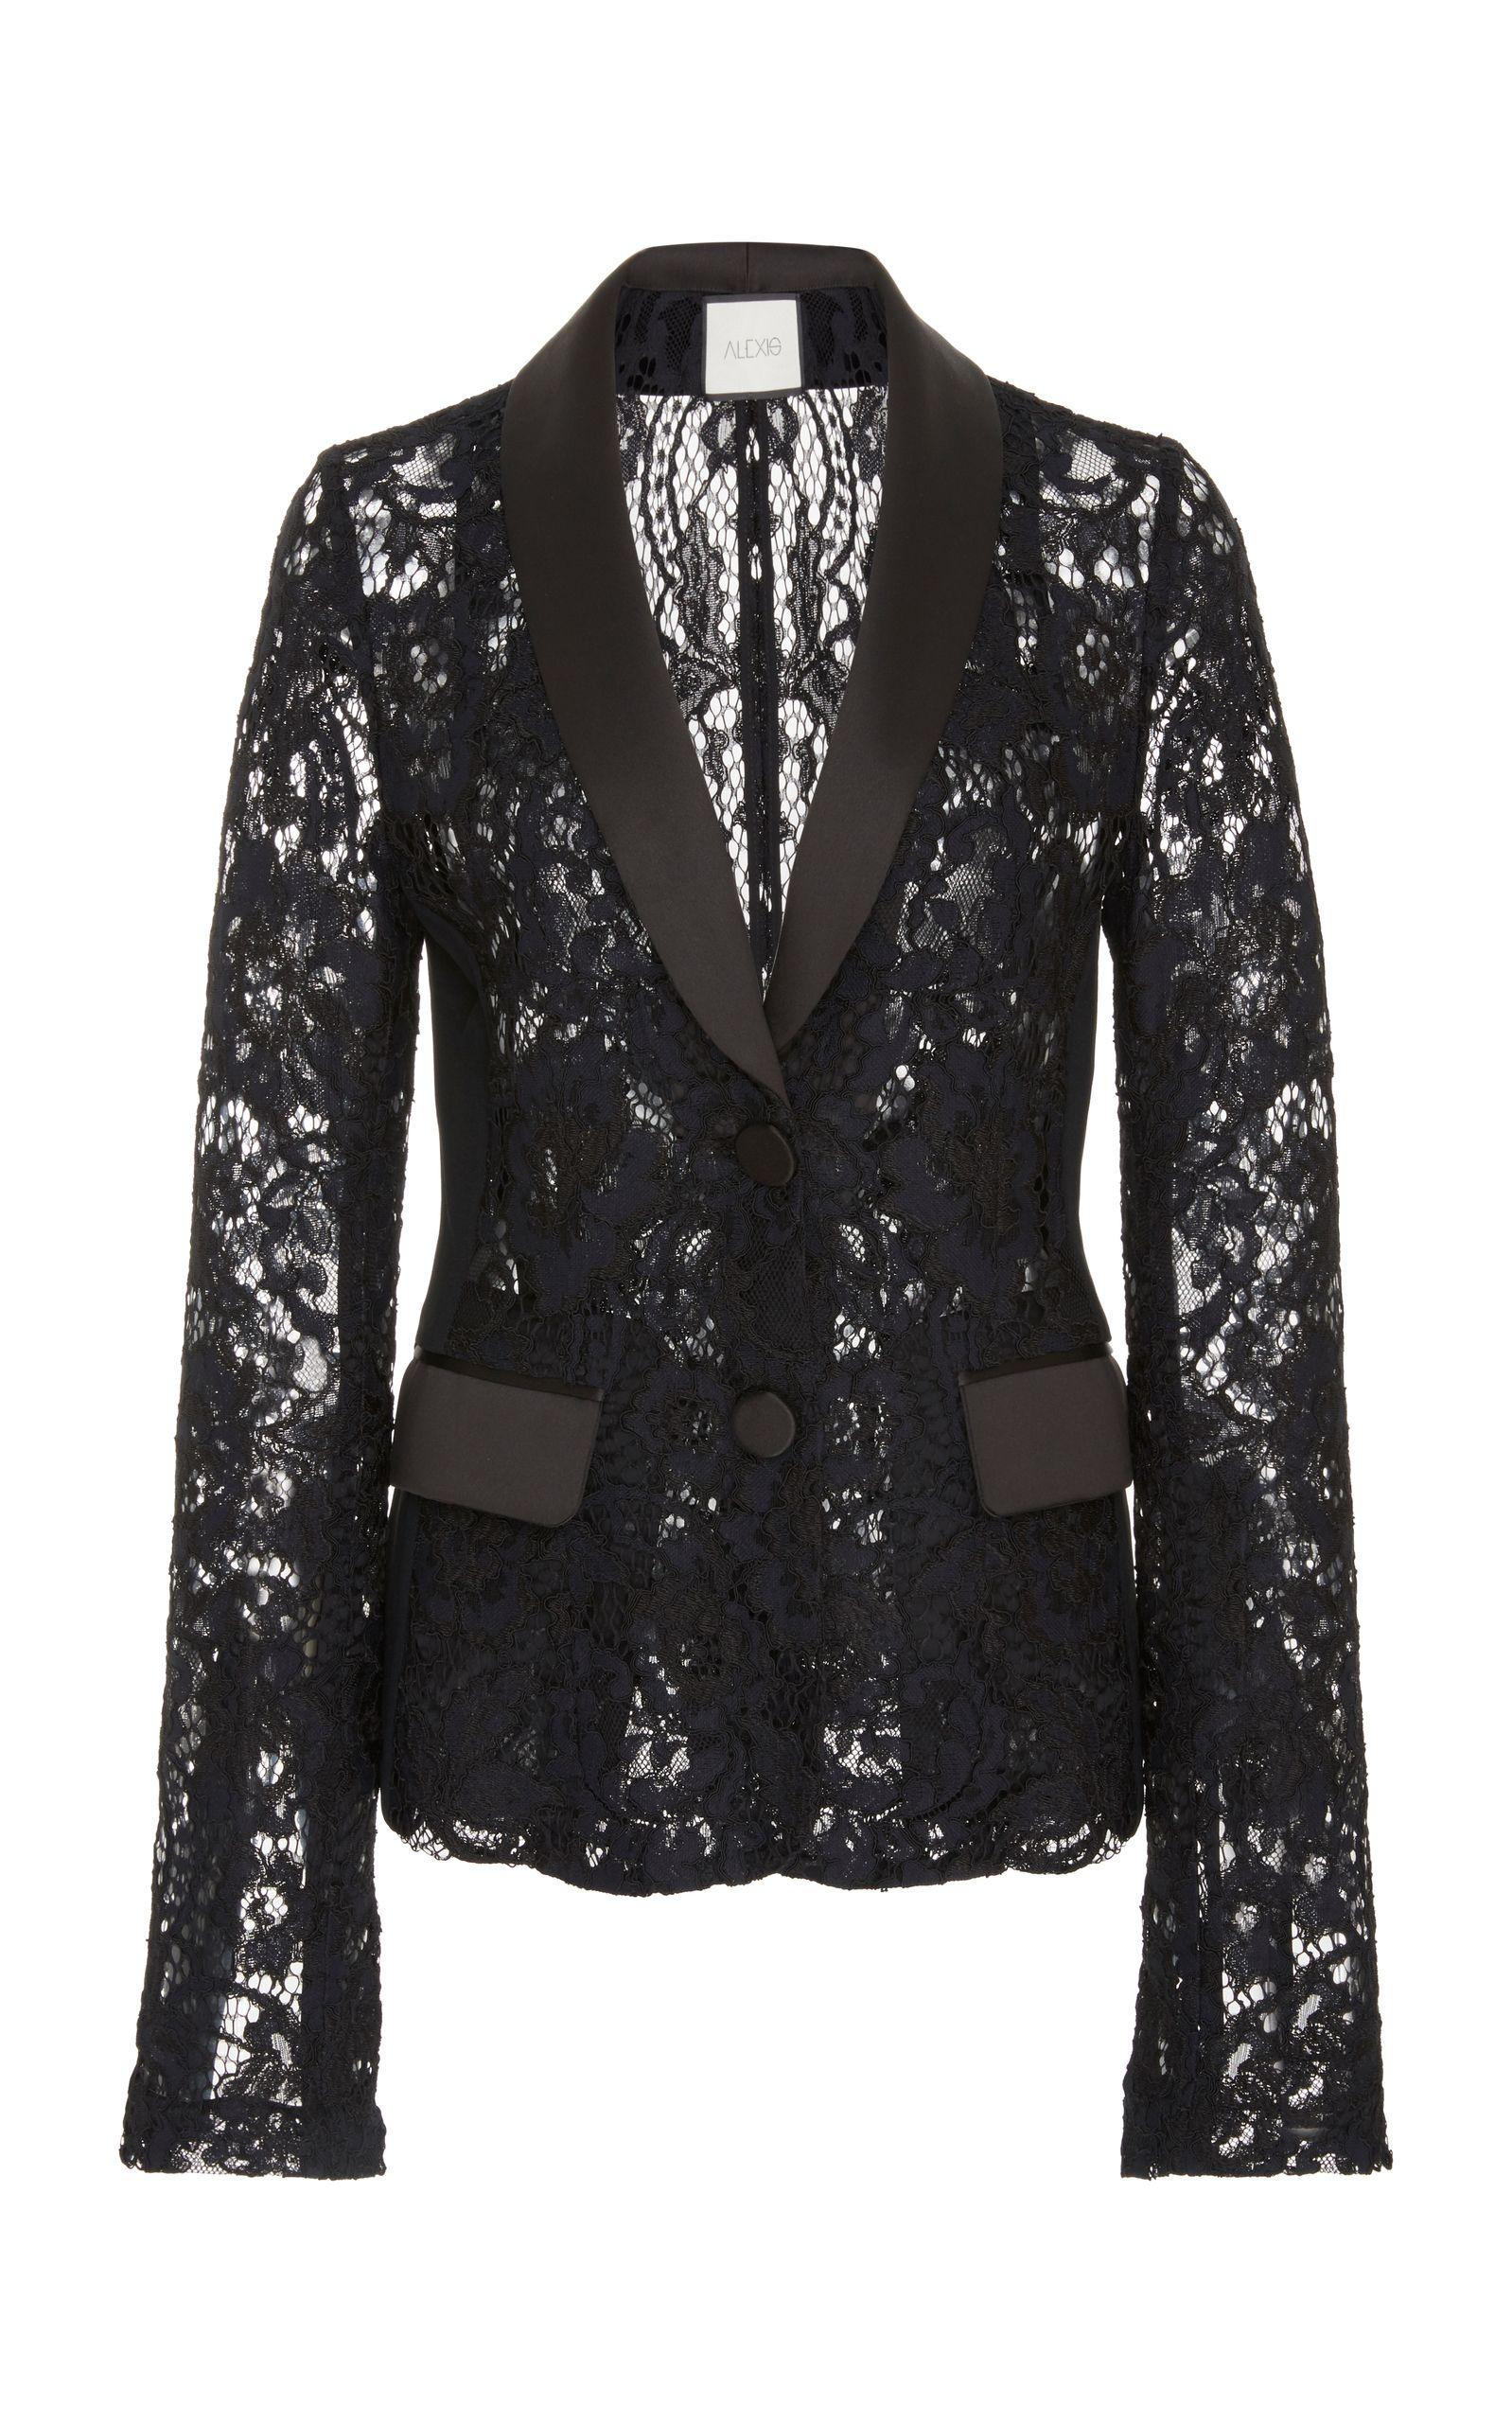 Alexis Luella Lace Blazer Lace Blazer Blazer Lace Jacket